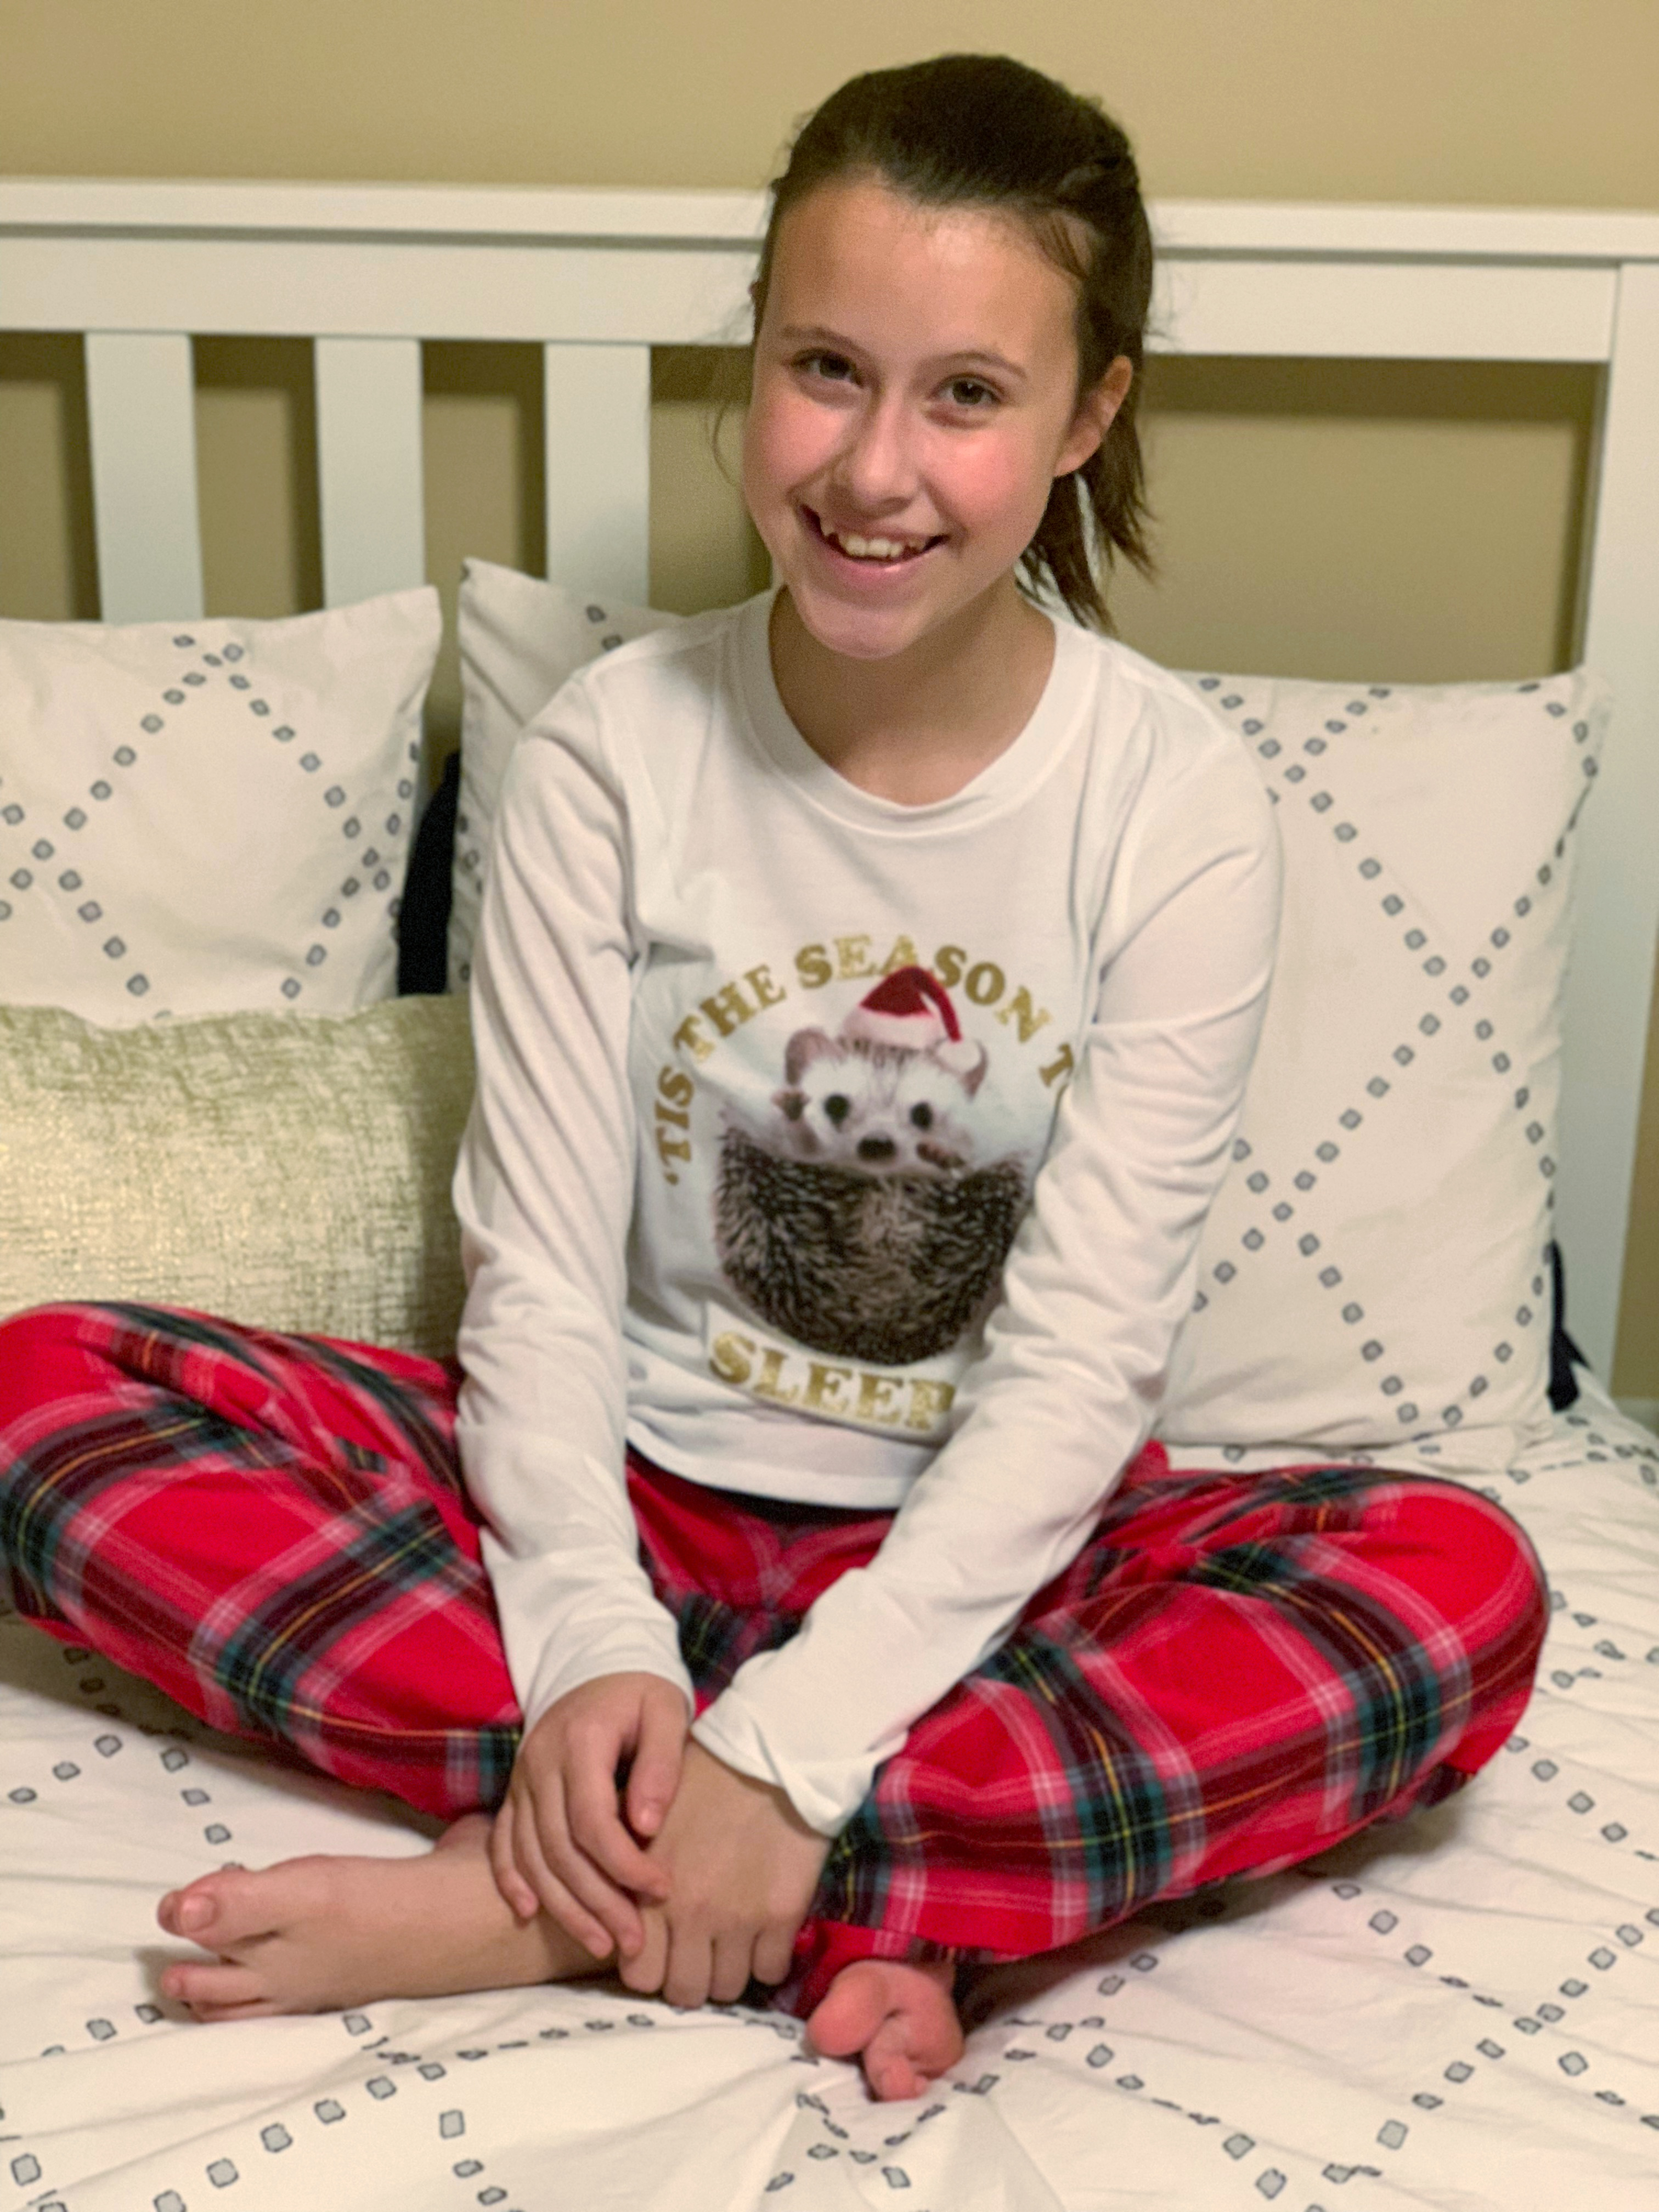 holiday pajamas for tweens